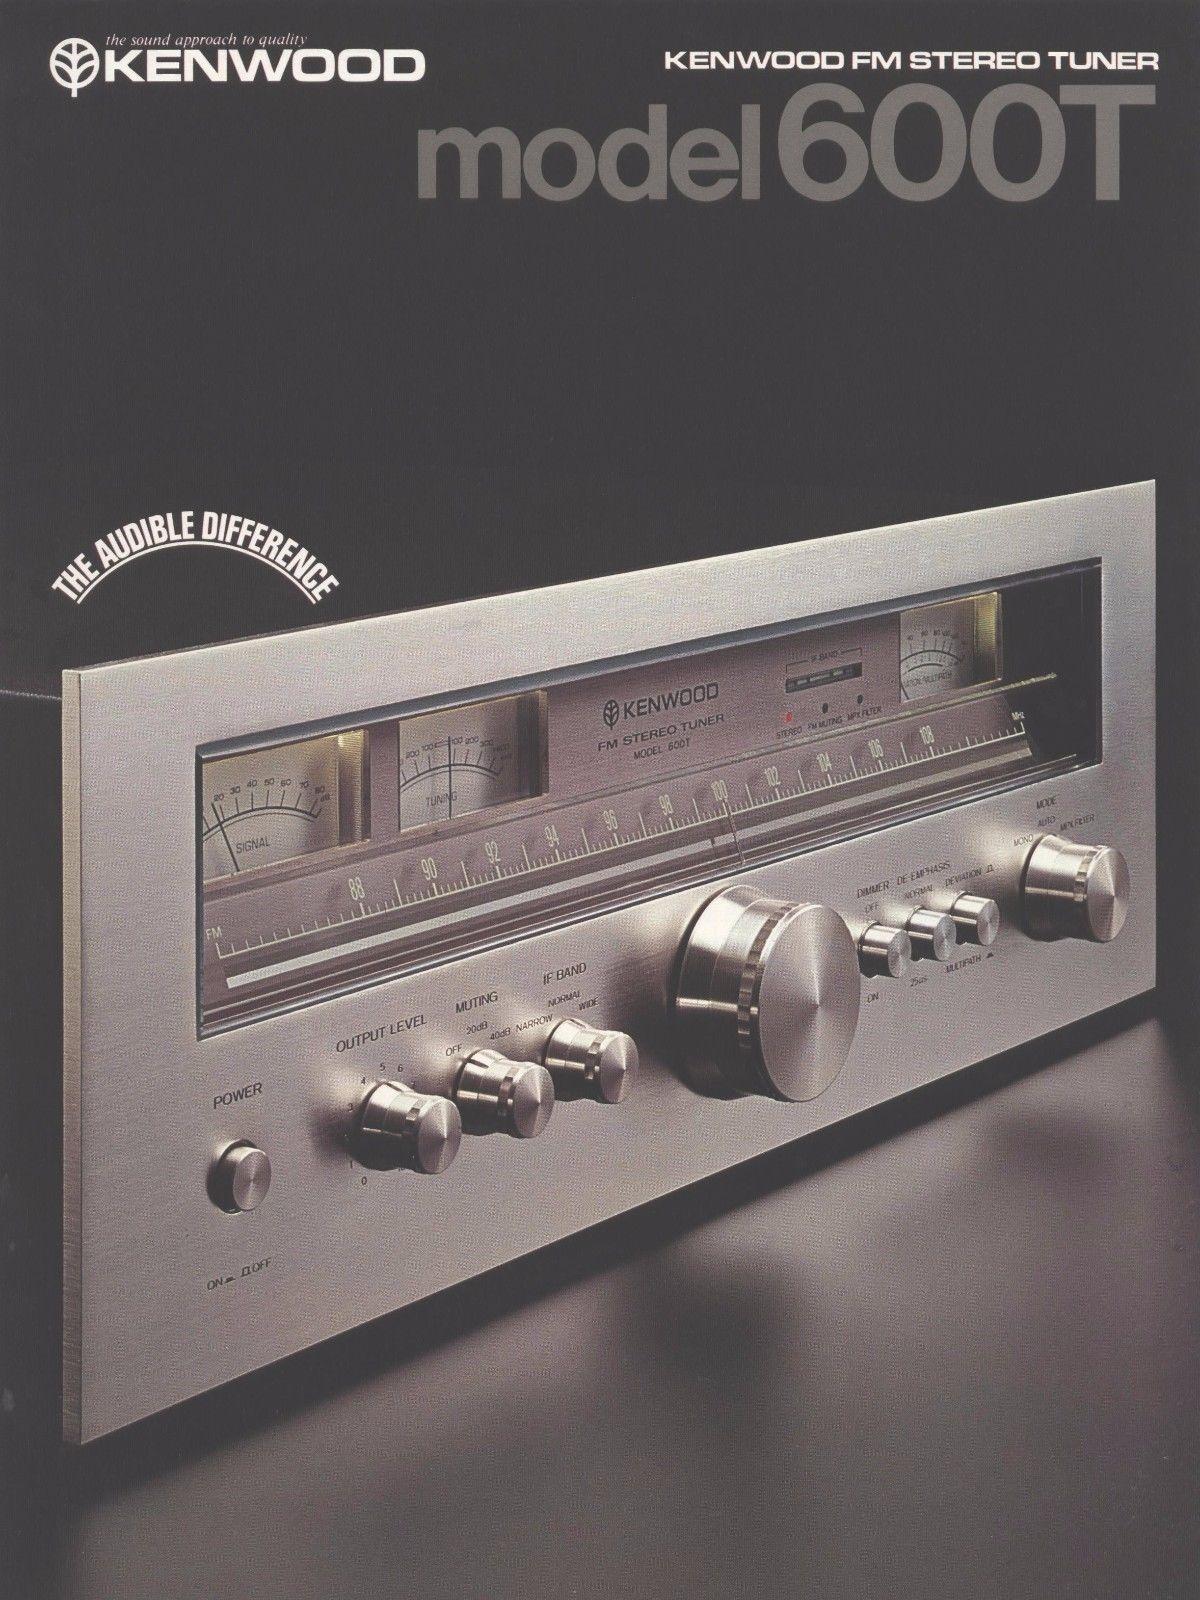 Tuner Information Center - Kenwood Tuners